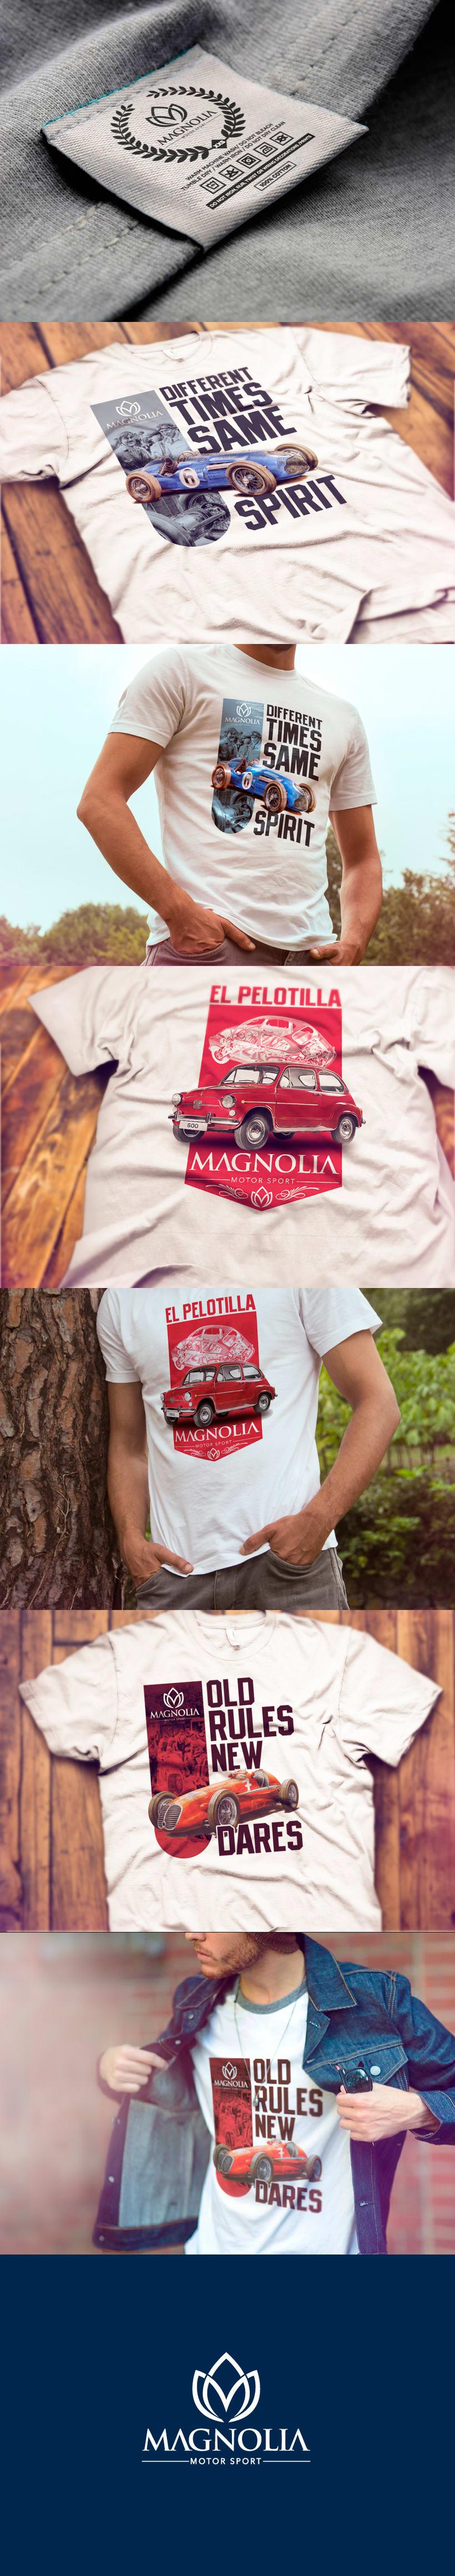 Magnolia T-shirt 0